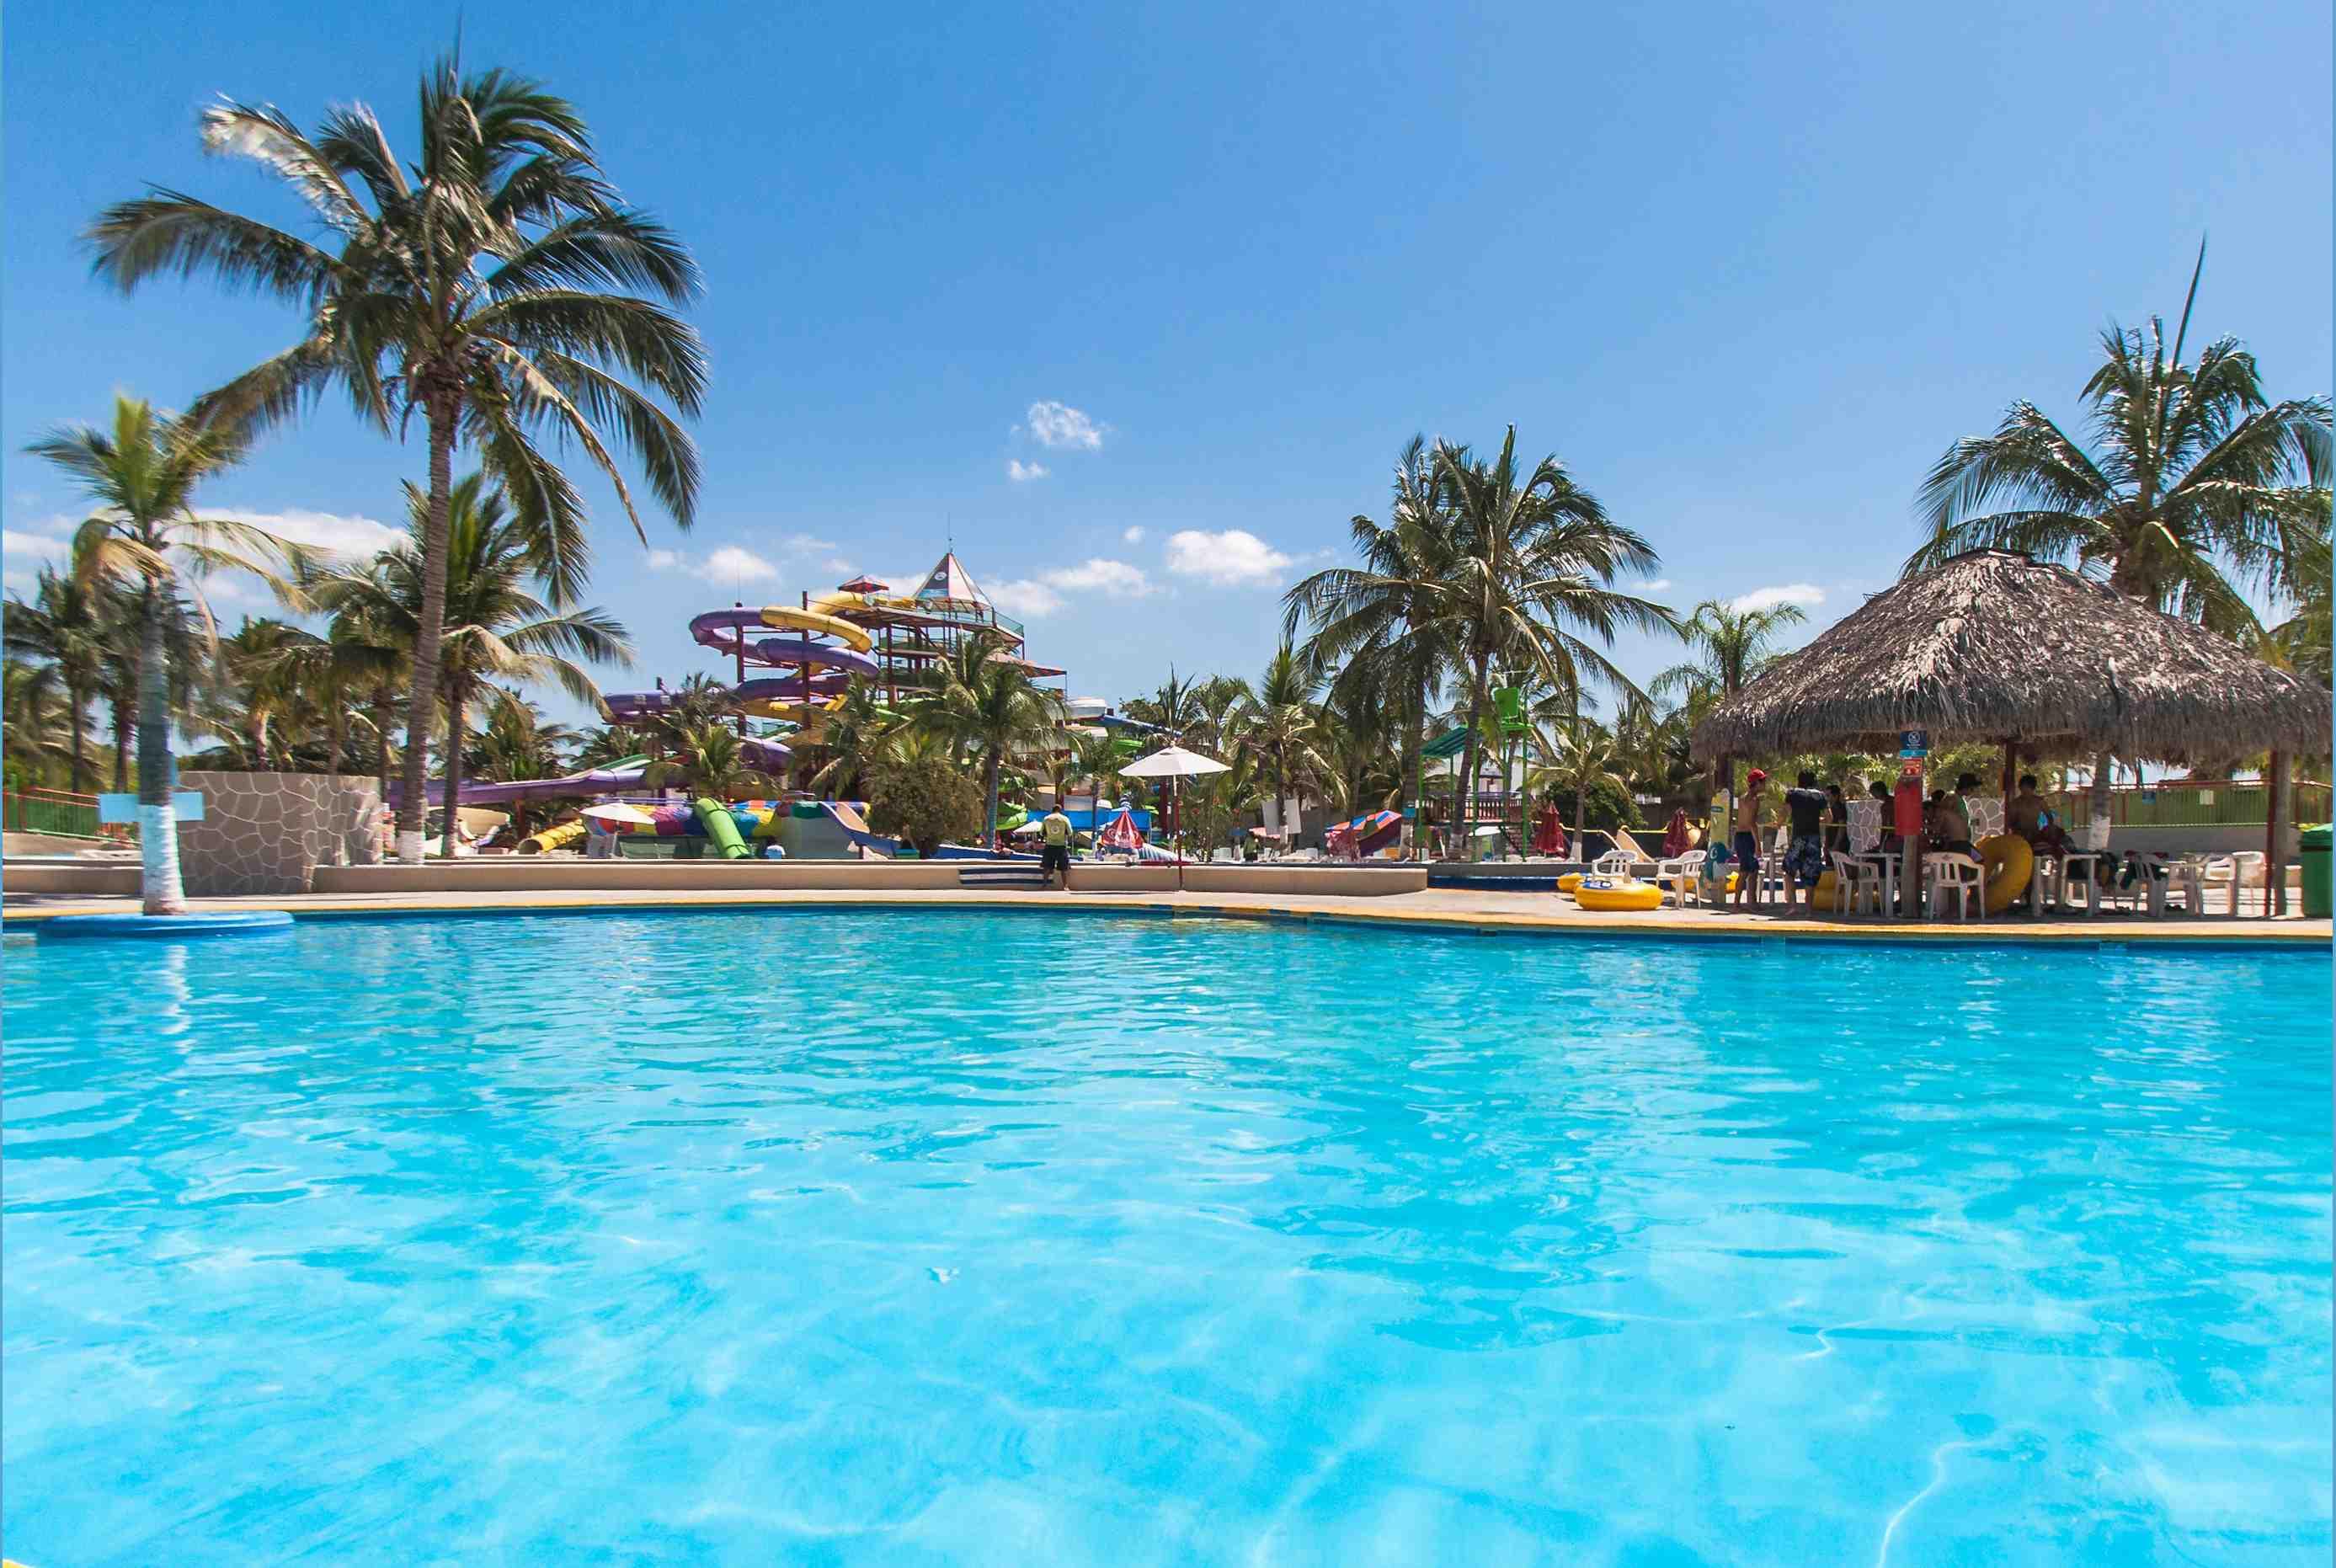 Aquaventuras Park With Unlimited Attractions - Last Minute Tours in Puerto Vallarta